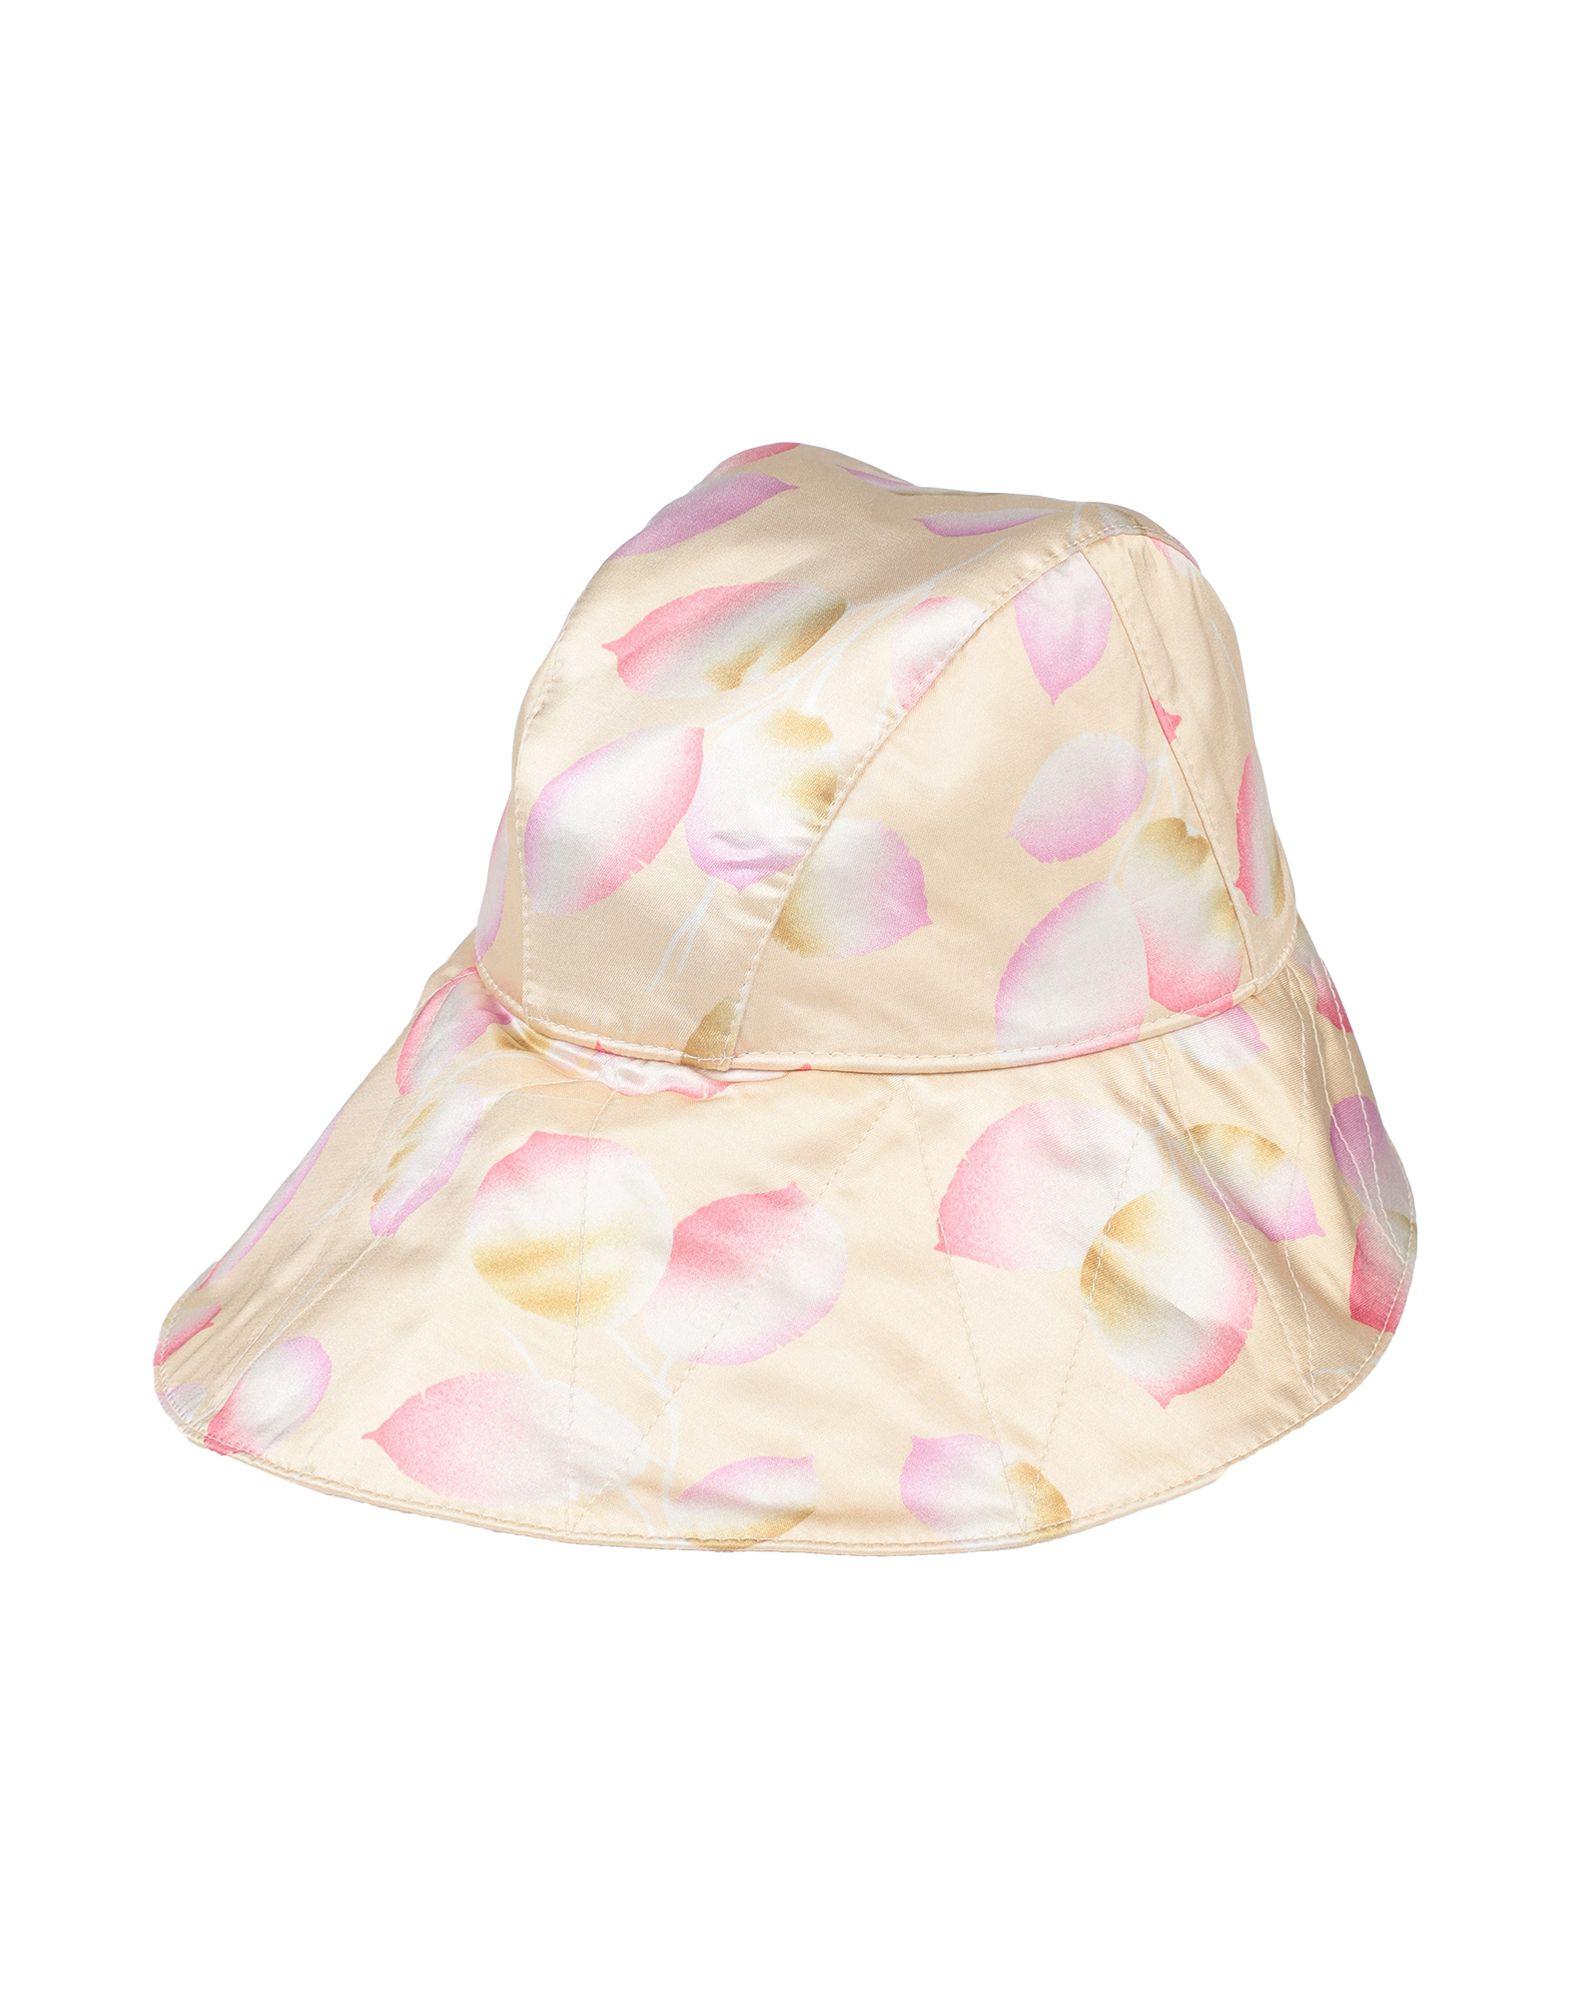 JIL SANDER Hats. satin, laces, floral design, medium brim. 100% Viscose